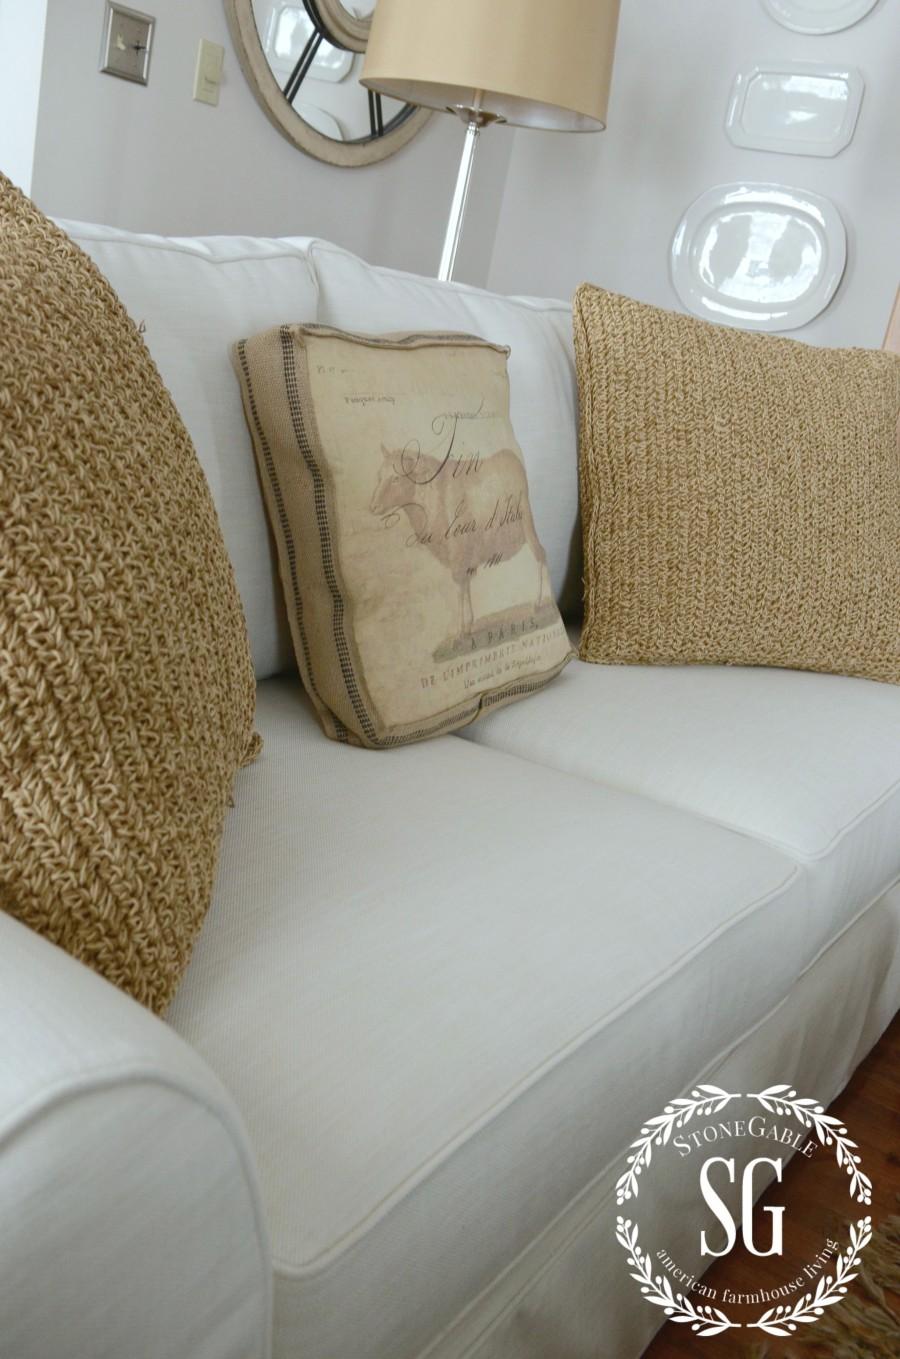 POTTERY BARN SOFA-sofa seat and cushions-stonegableblog.com